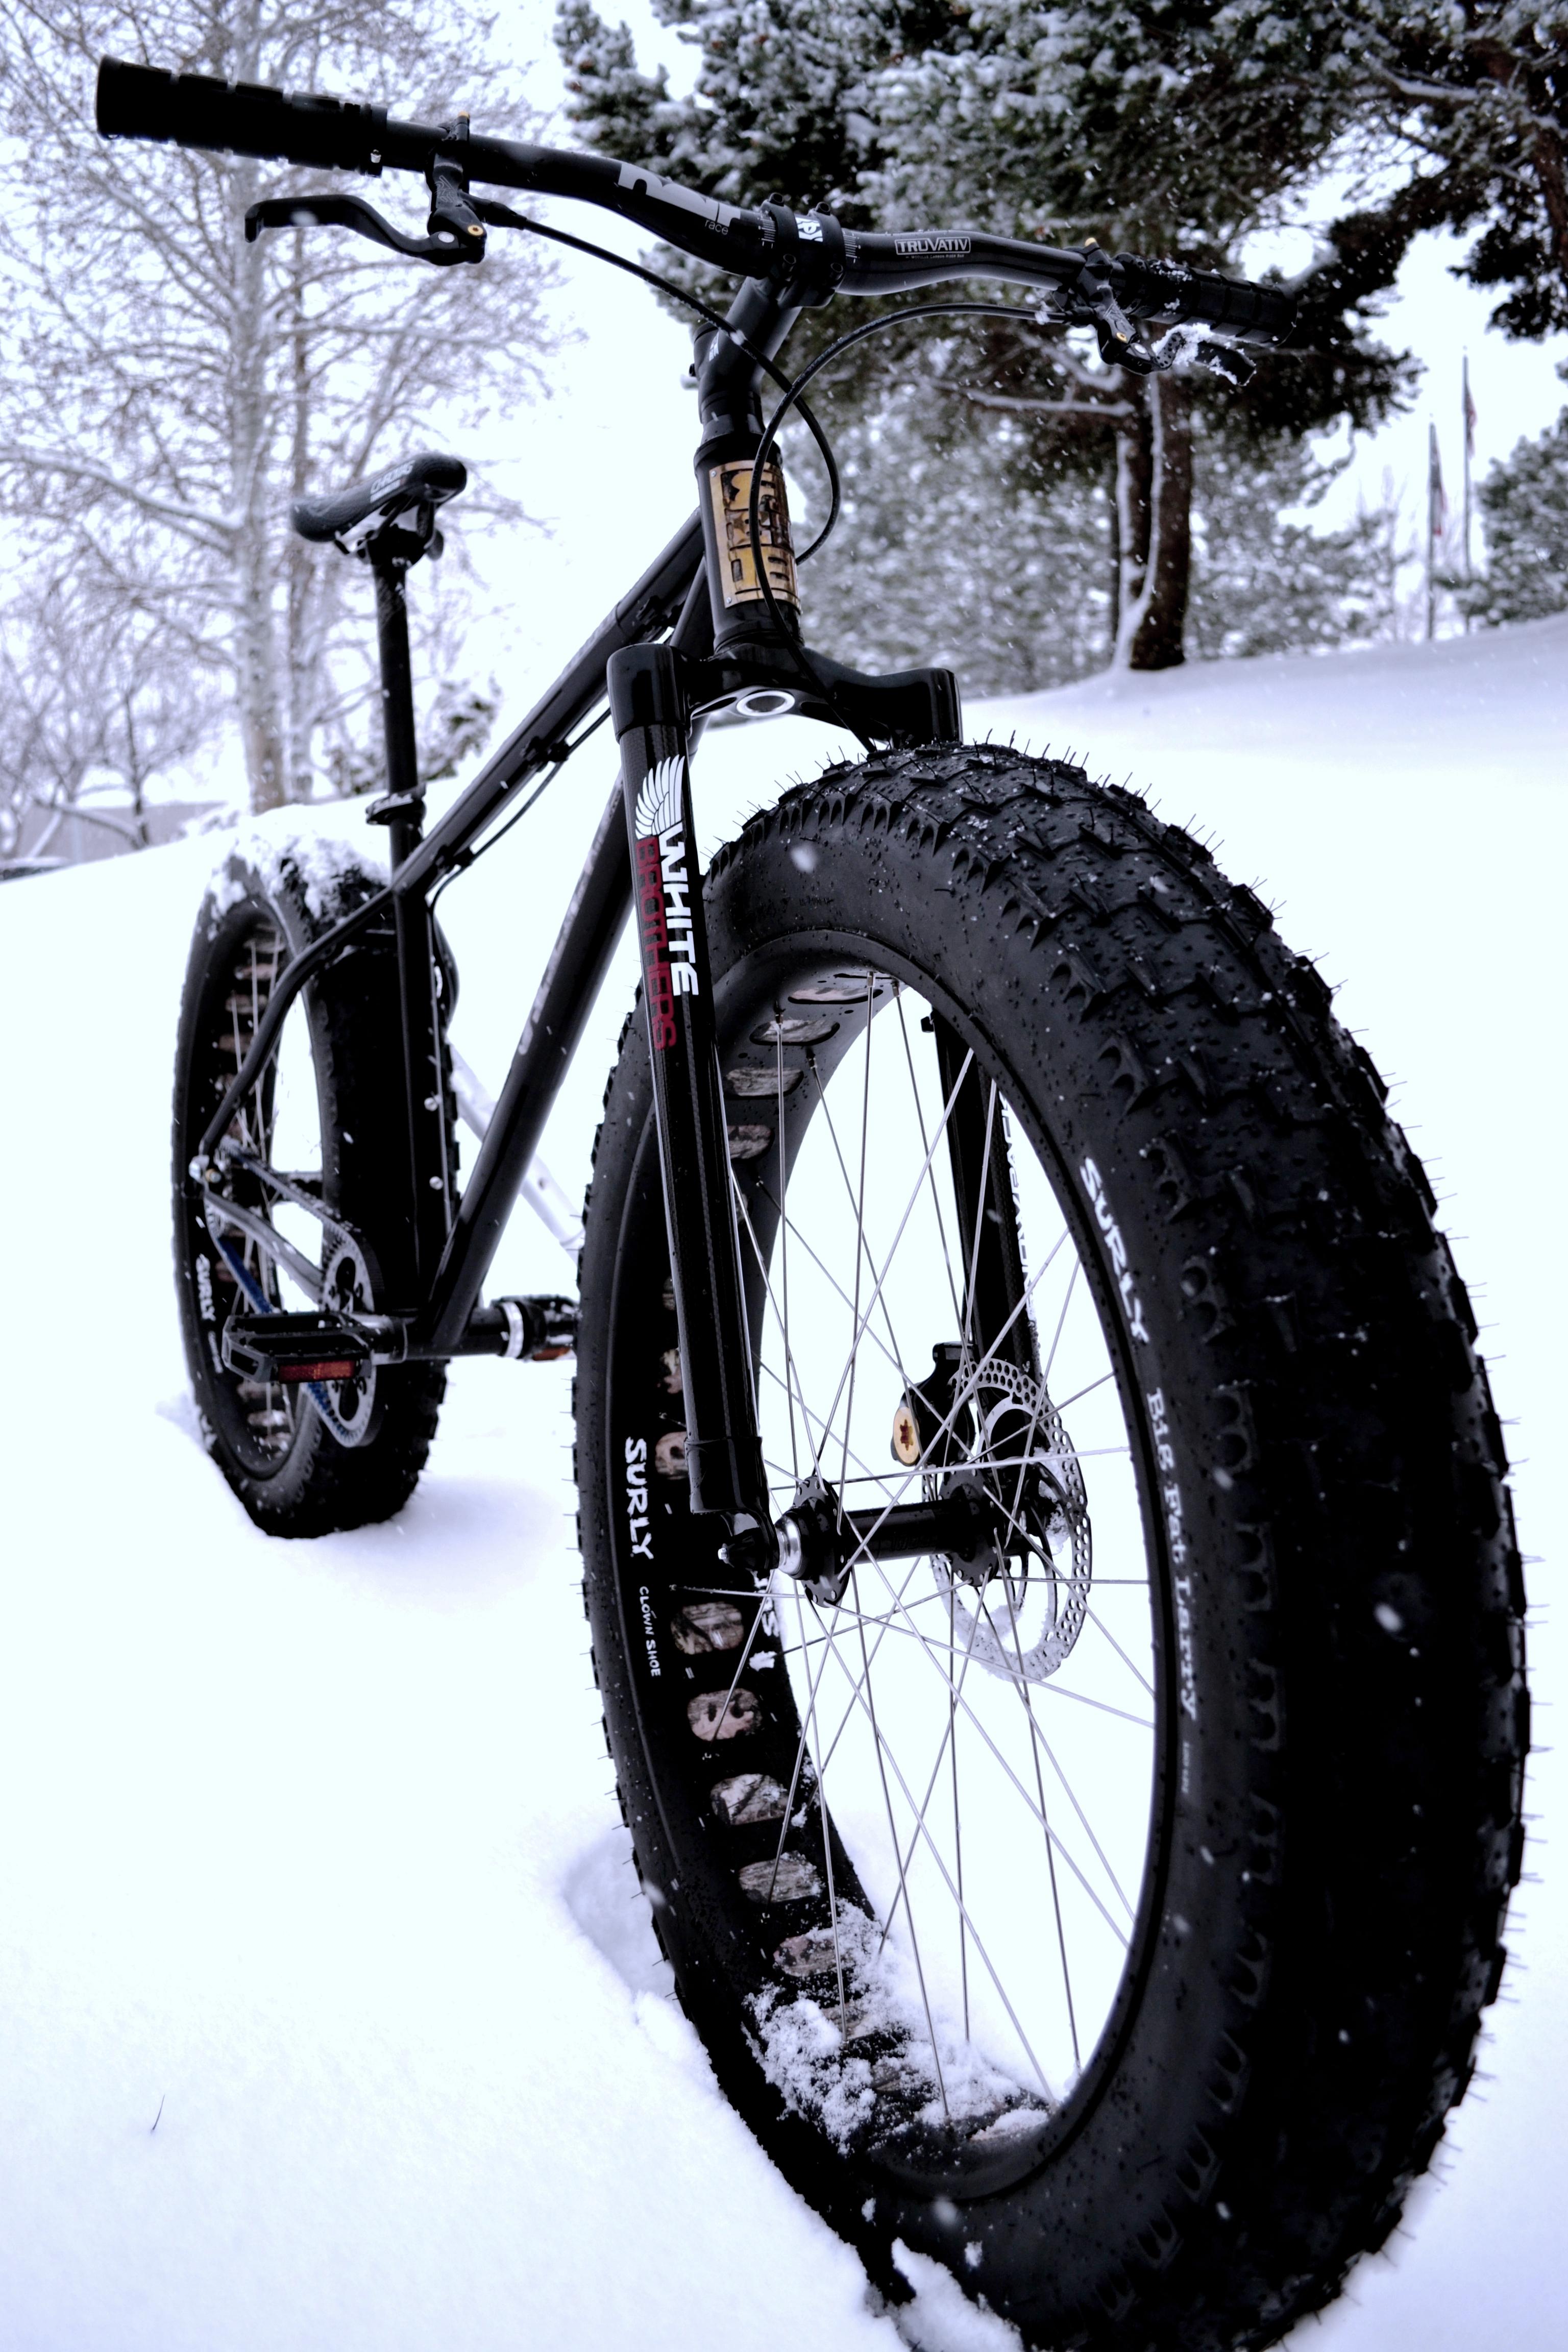 REEBadonk in snow